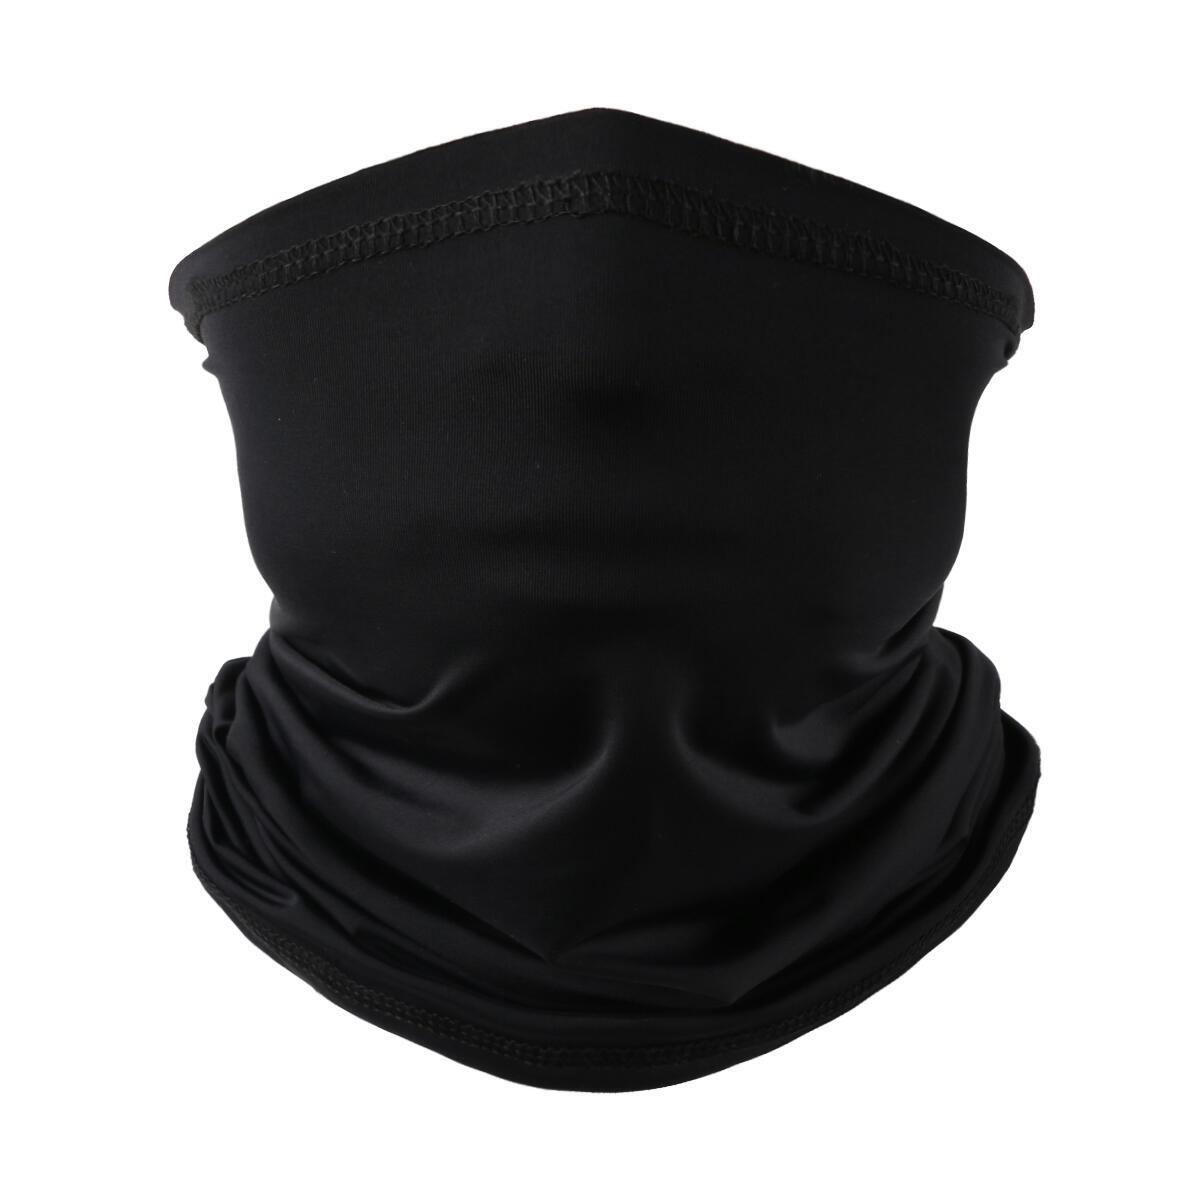 Landisun Black face cover Bandana